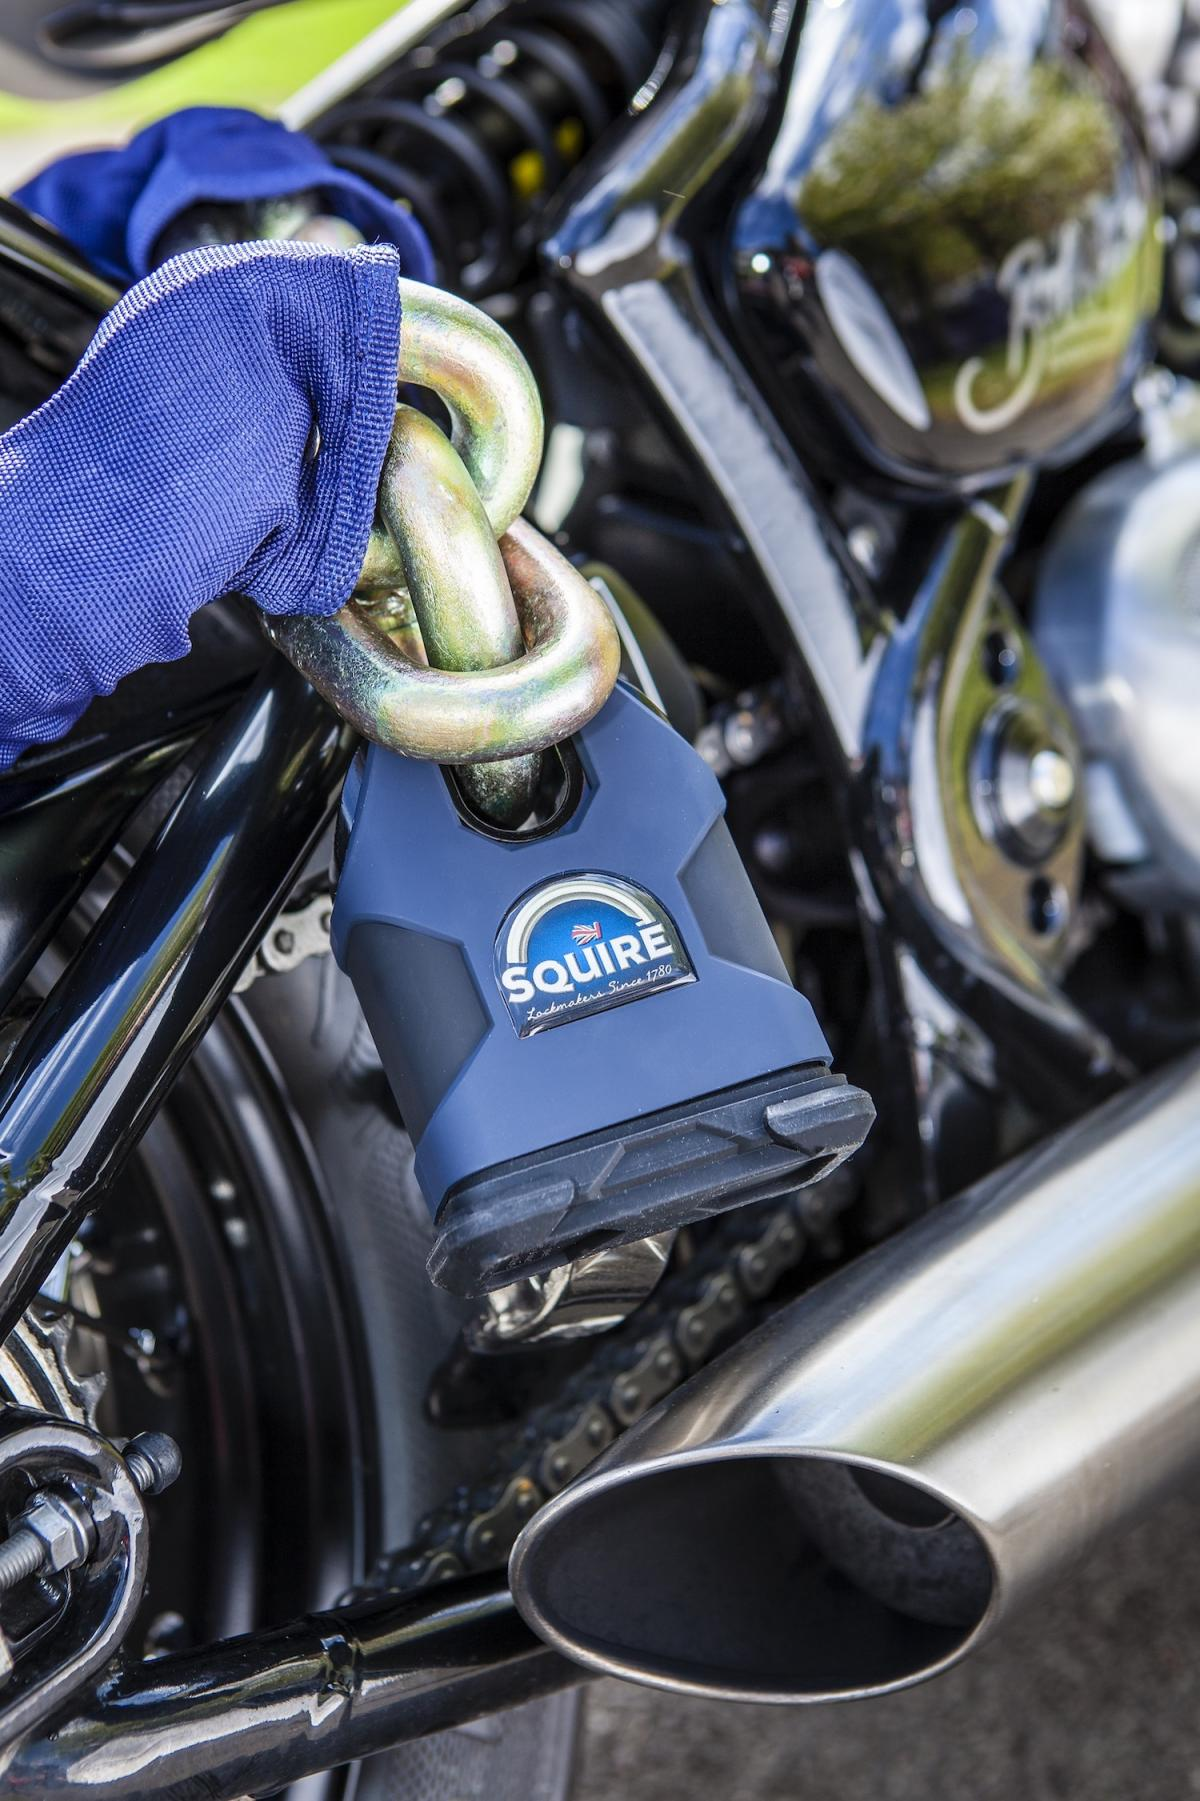 Squire bike locks